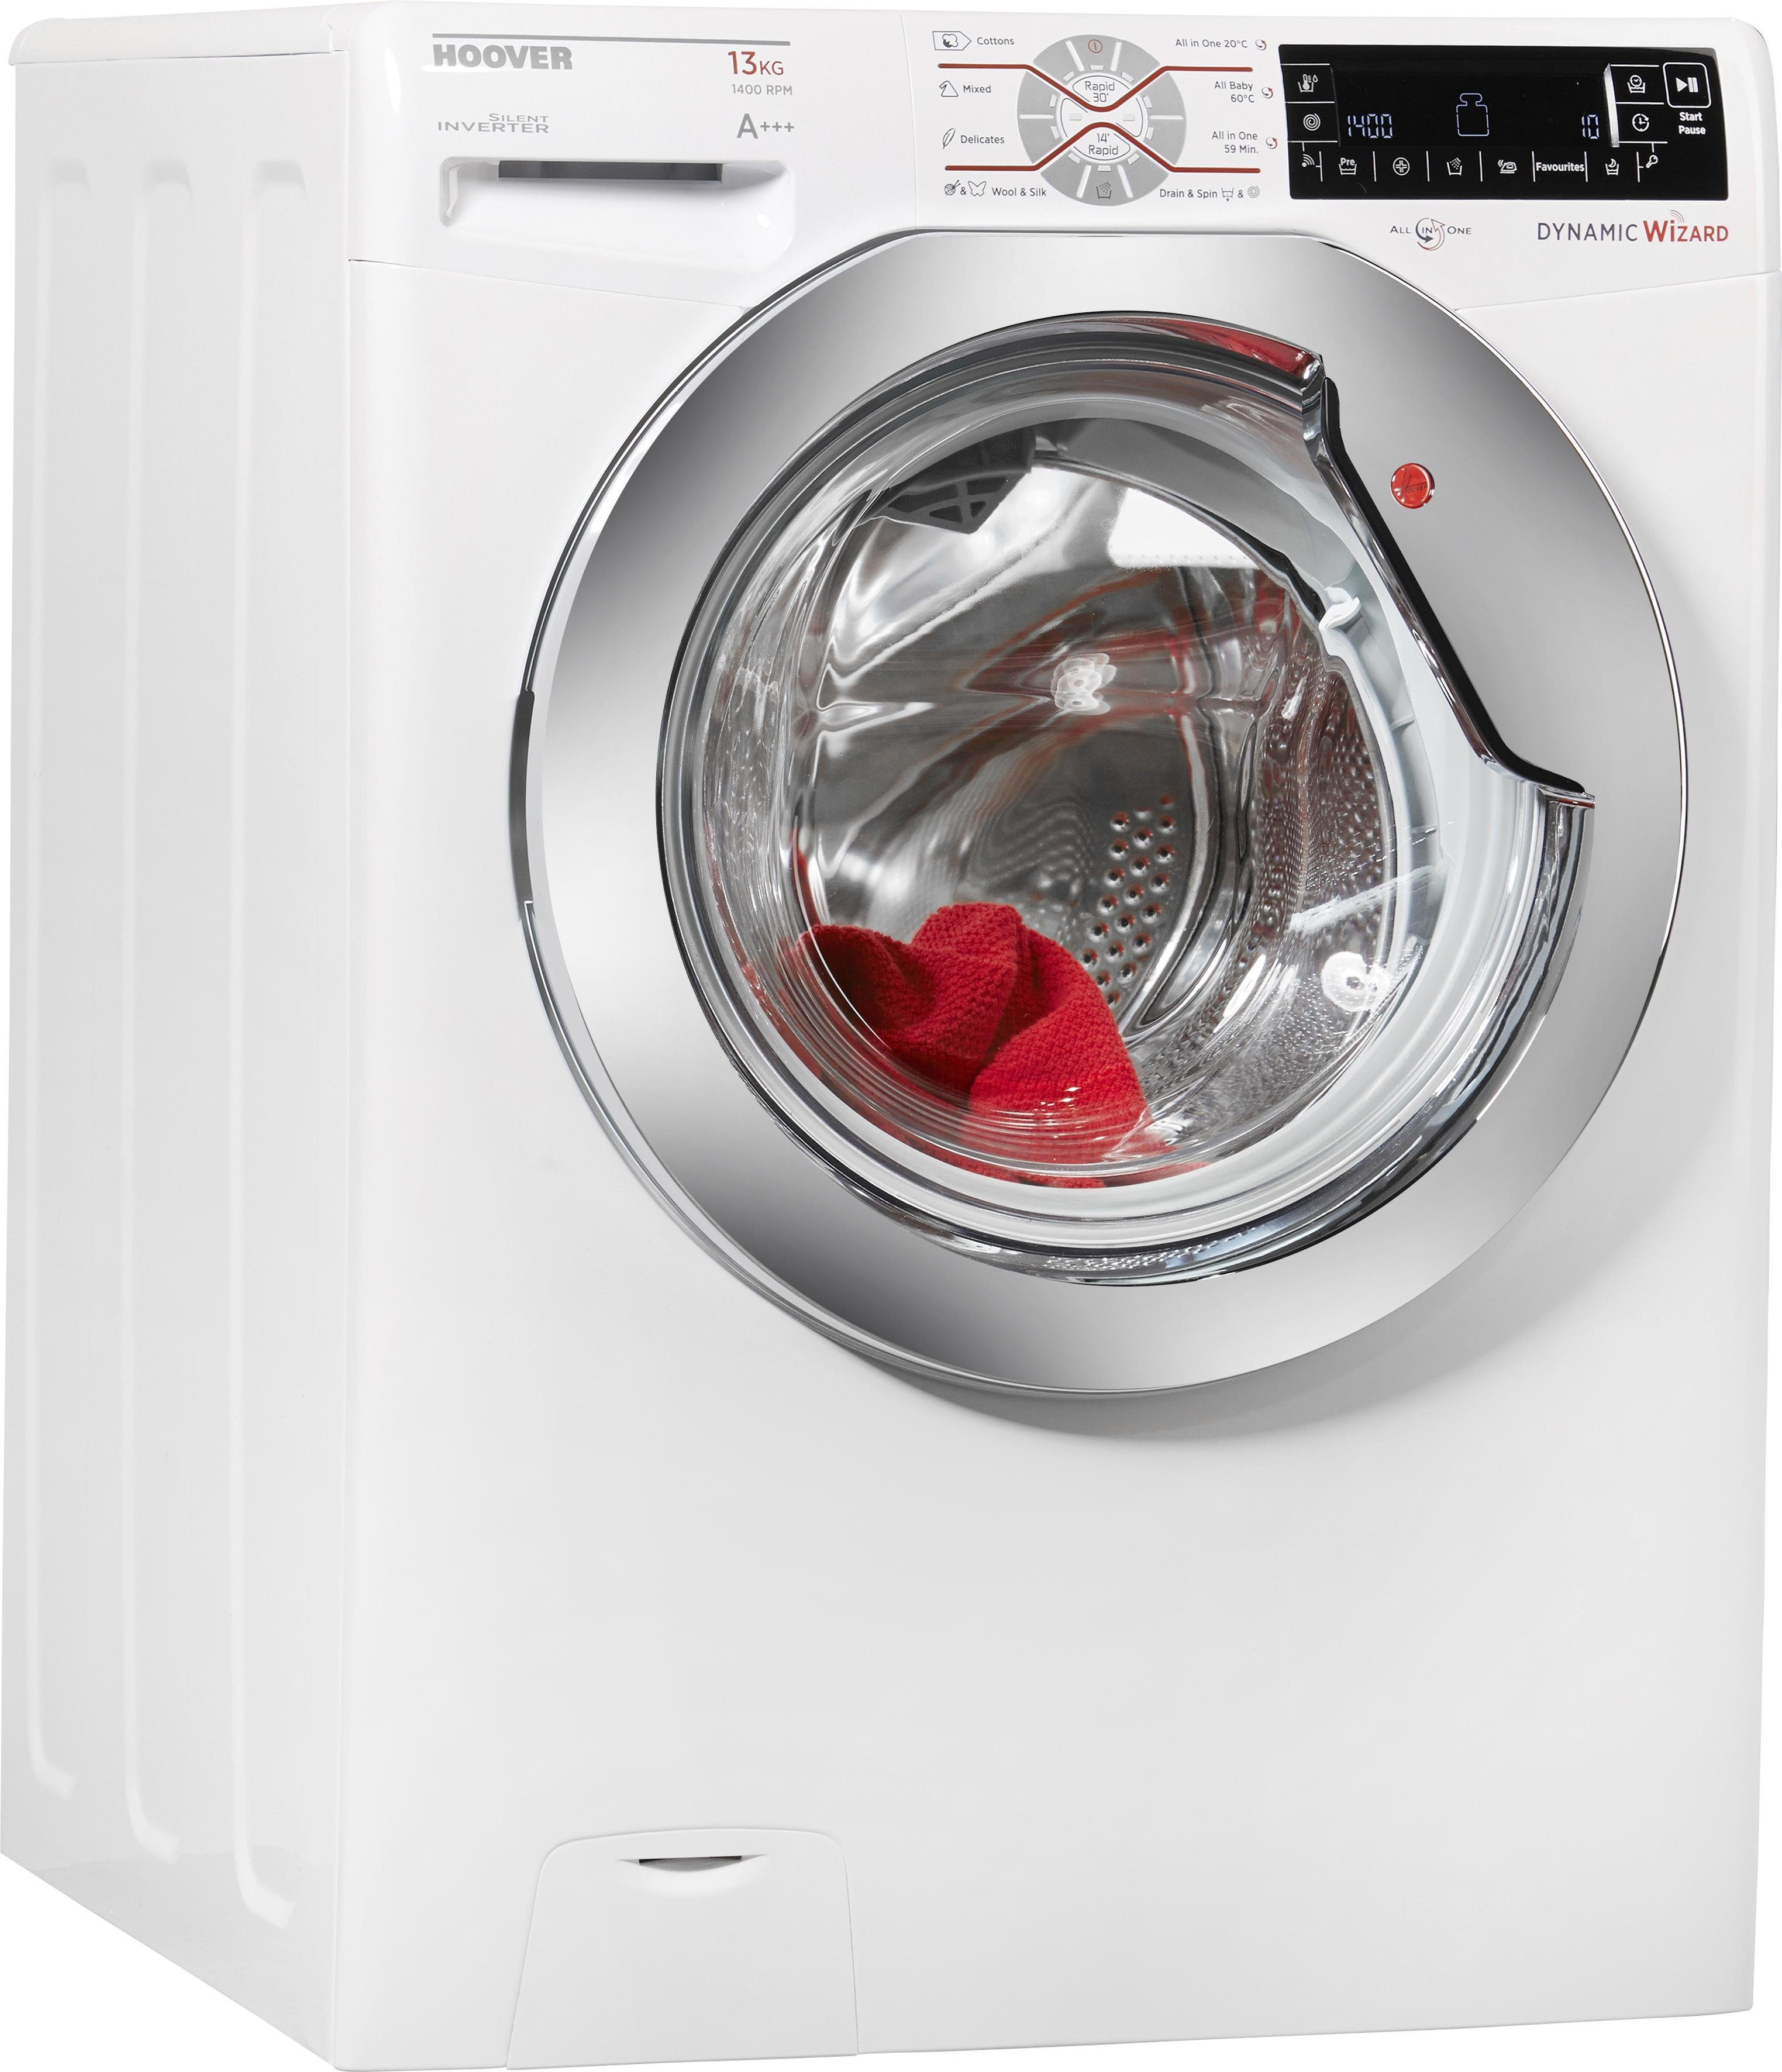 Hoover Waschmaschine DWT 413 AH, 13 kg, 1400 U/Min